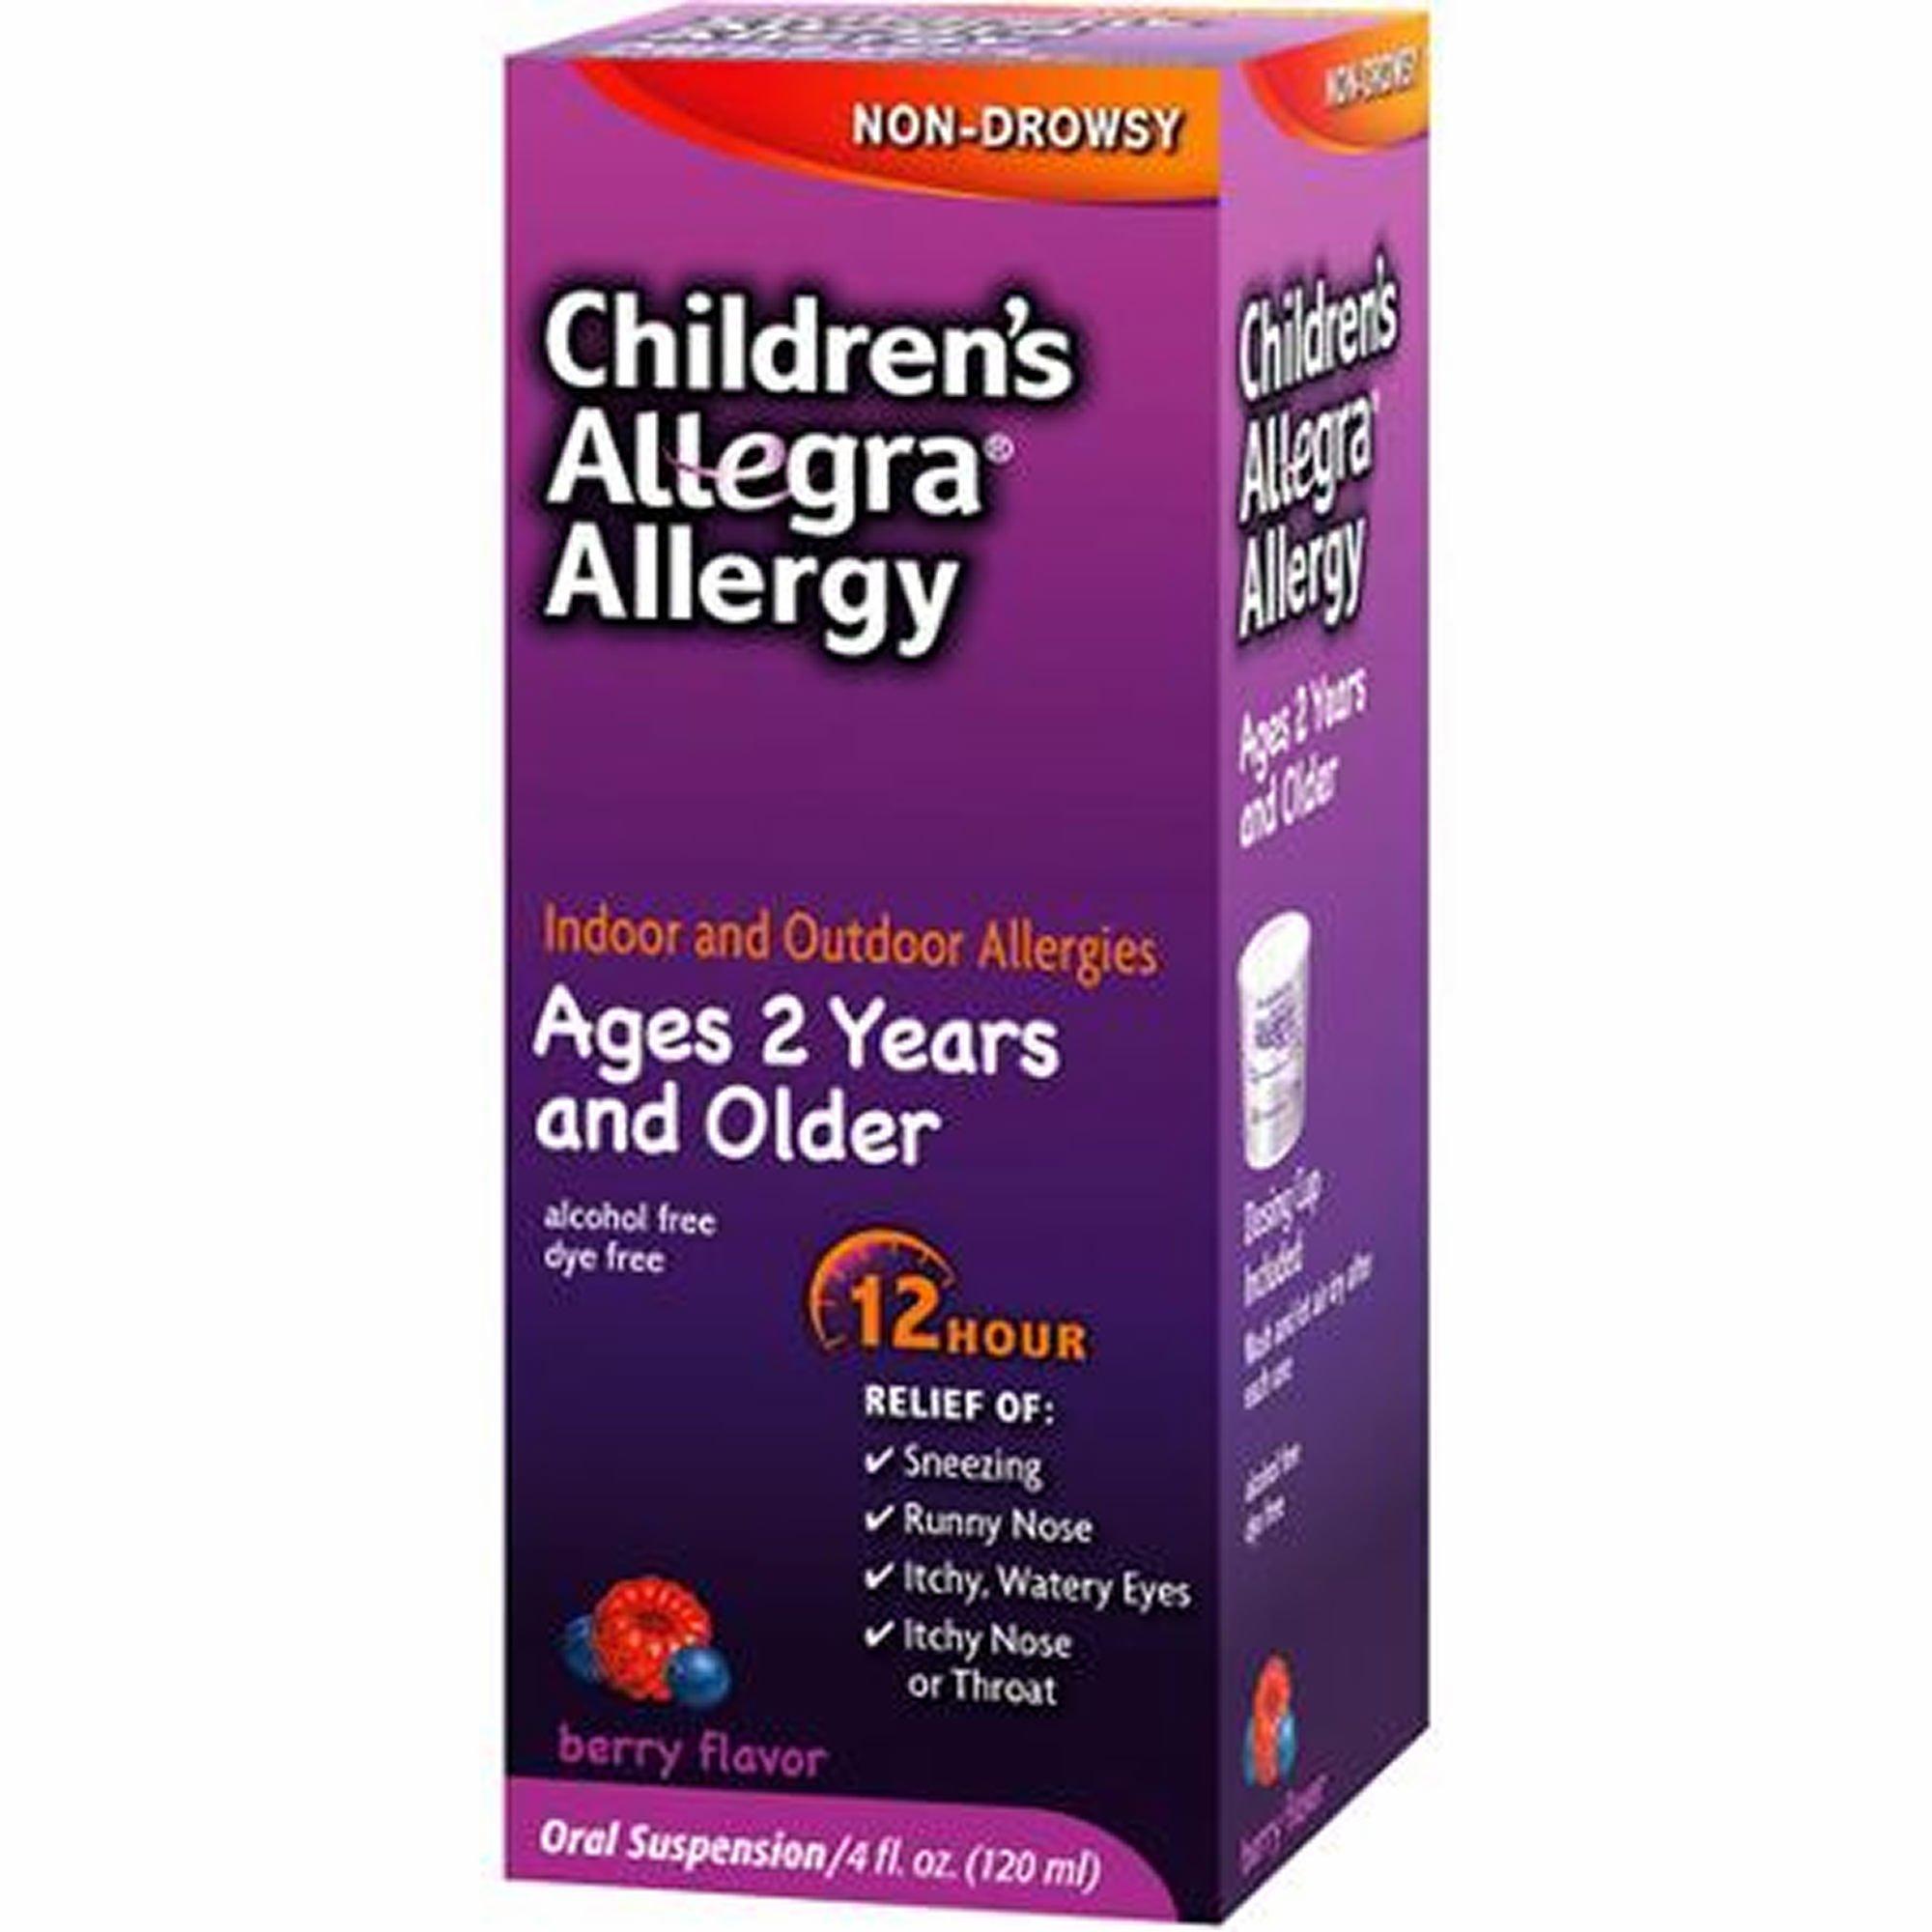 Allegra Children's 12-Hour Allergy Relief Liquid, 3 ct./4 oz. (pack of 6)